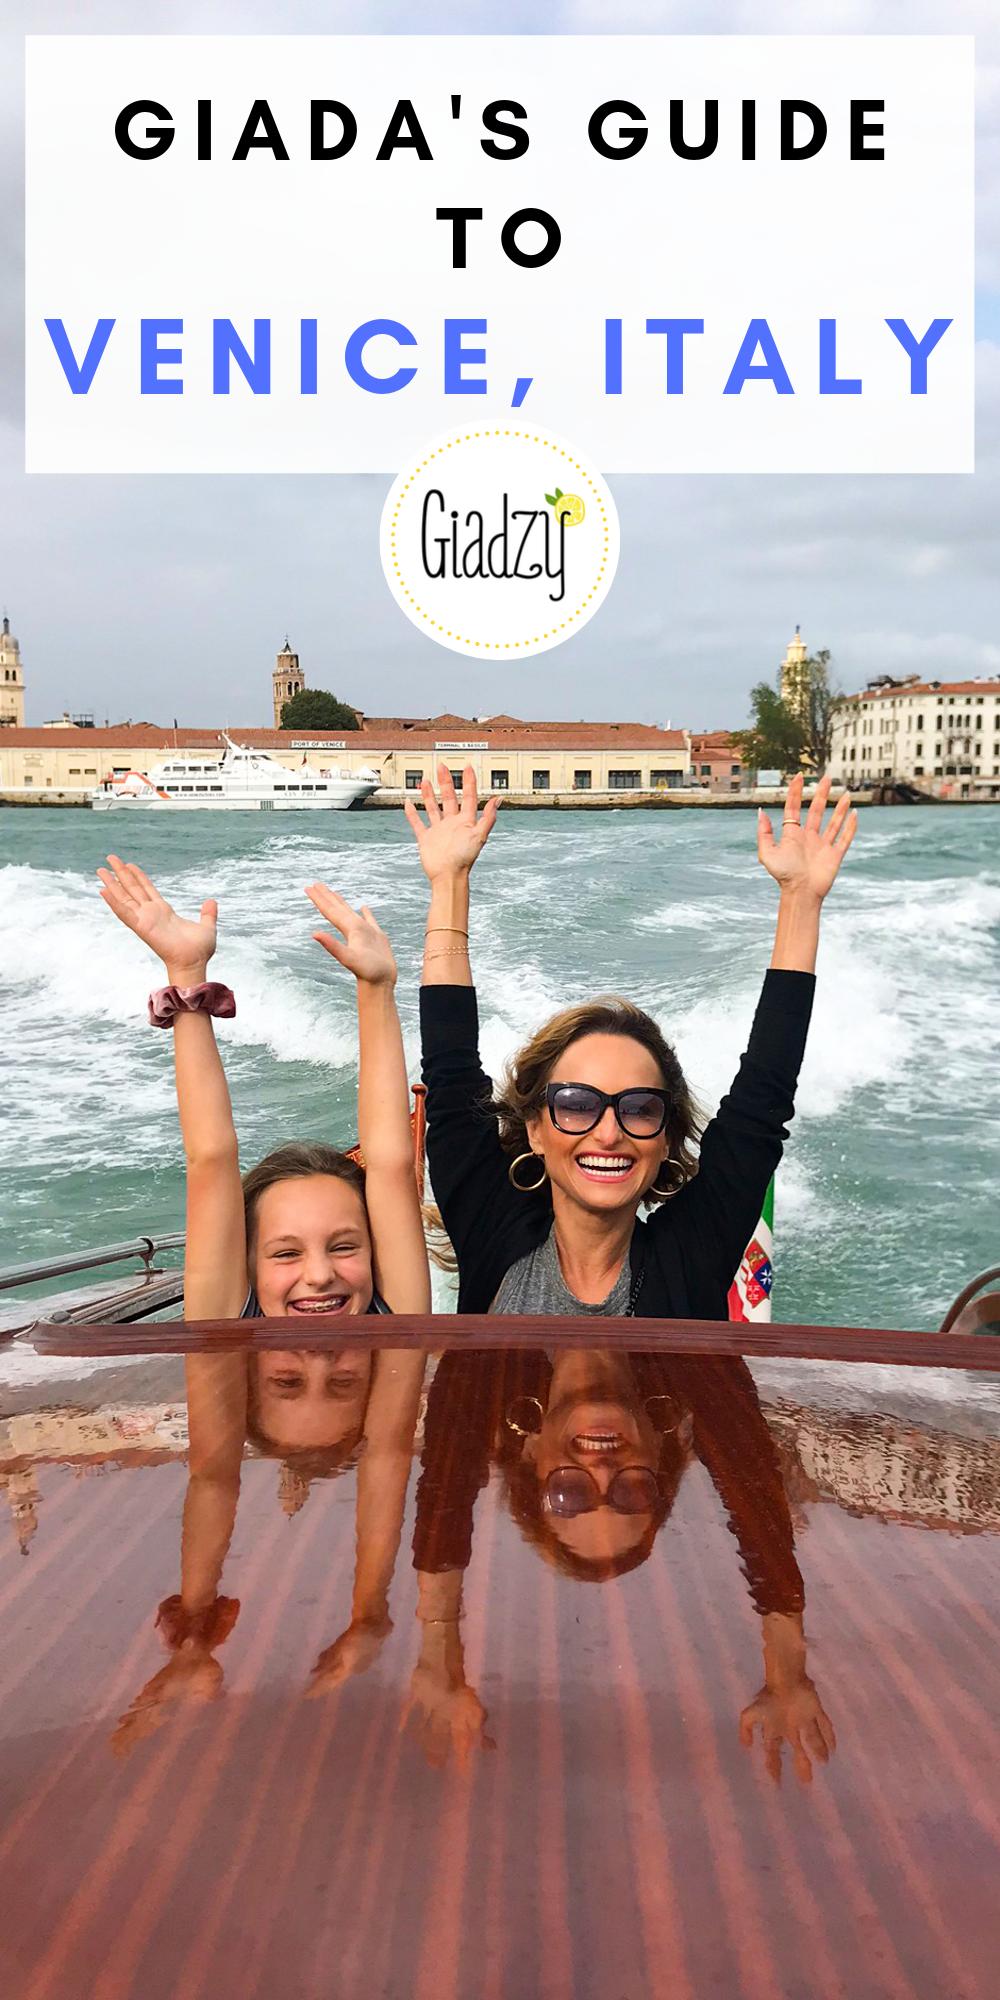 Photo of Giada's Guide To Venice, Italy